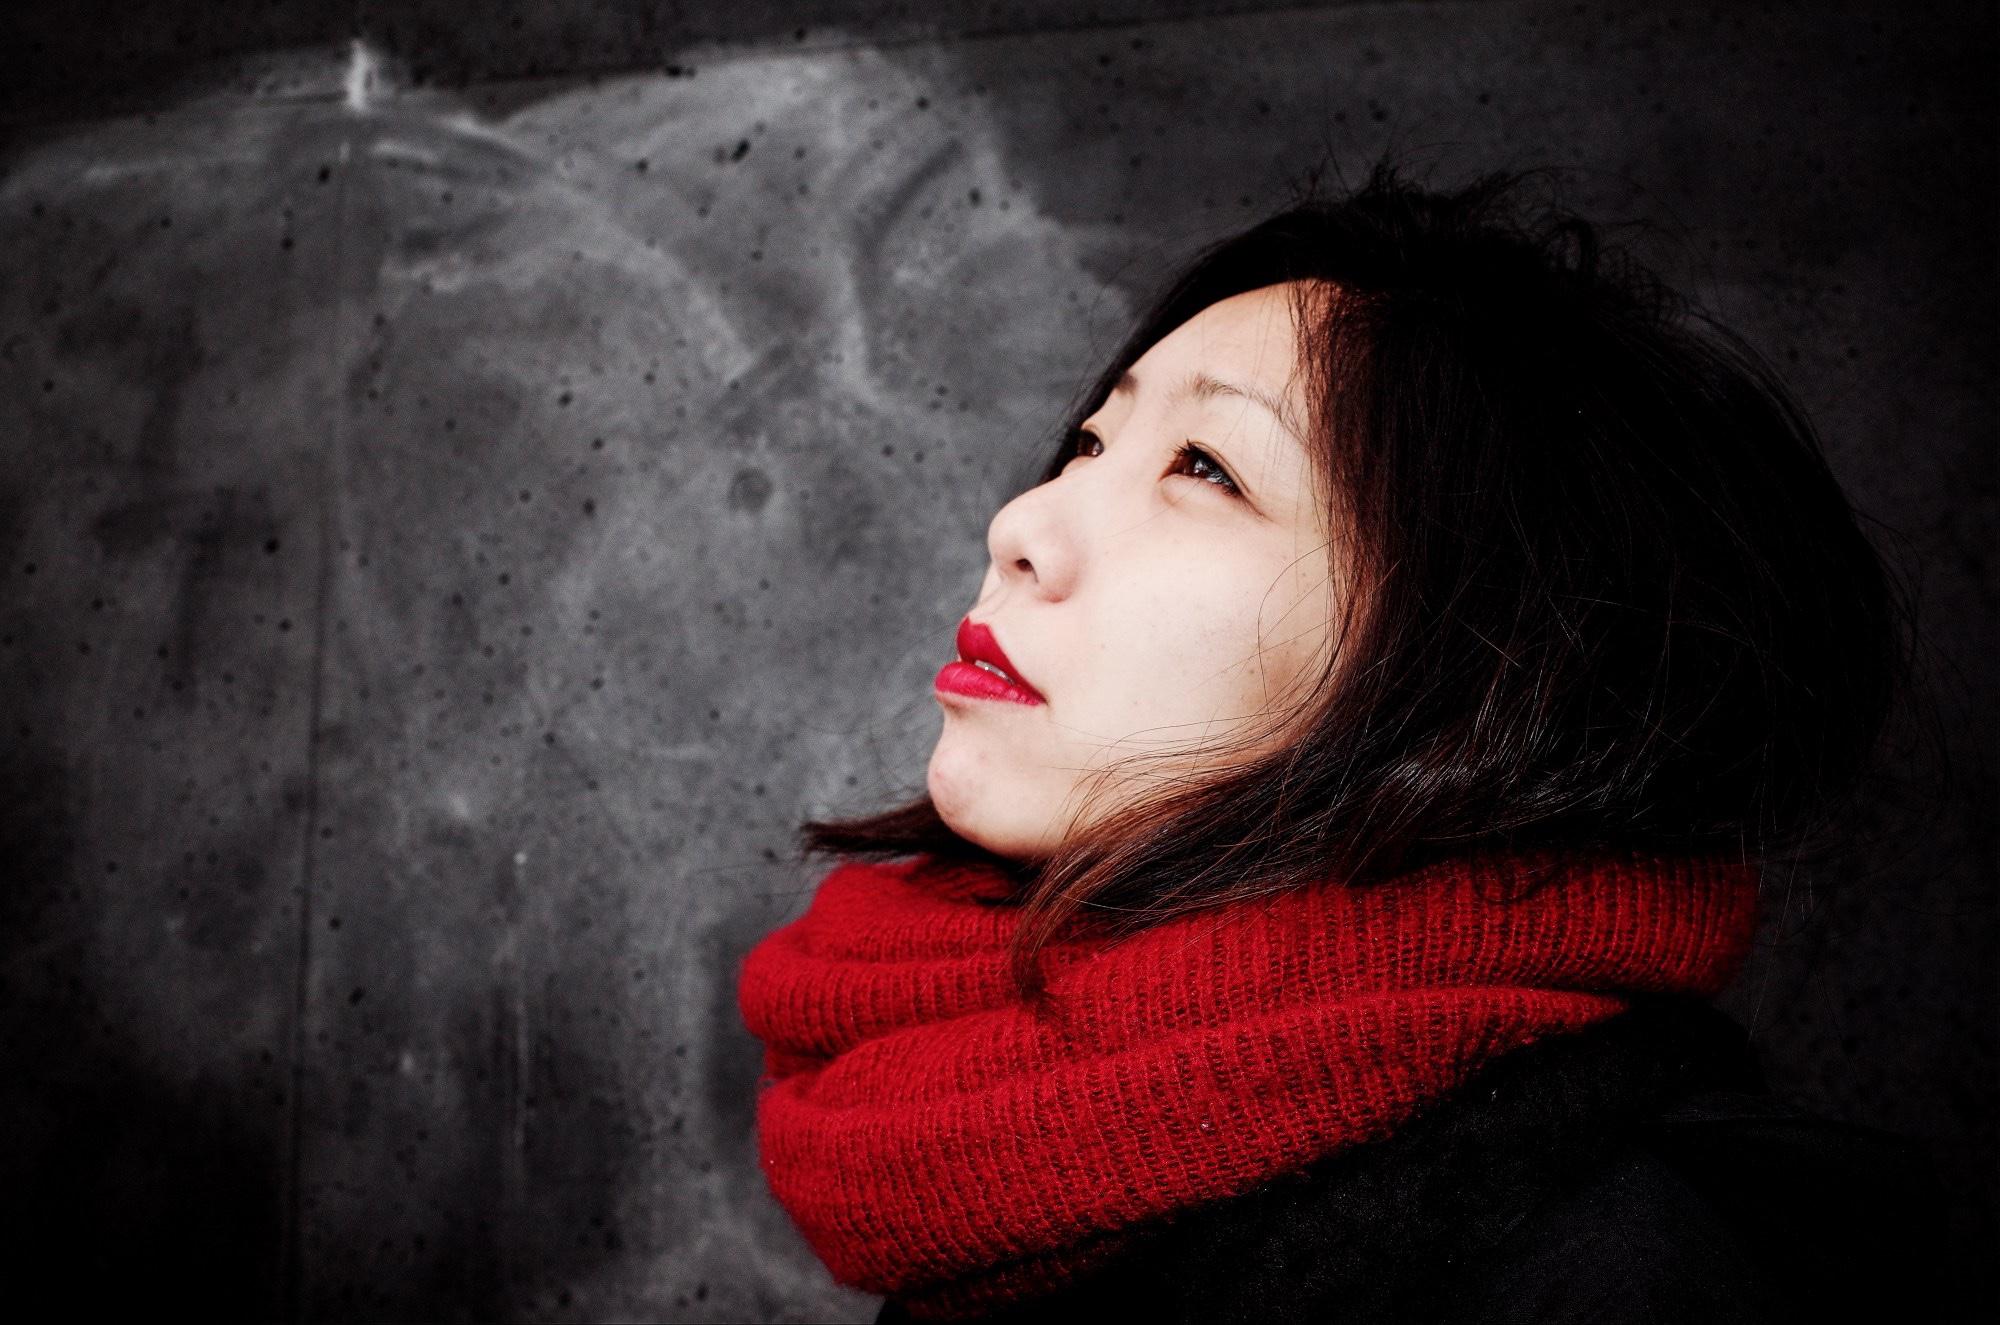 Cindy red scarf selfie Berlin, 2017 #cindyproject